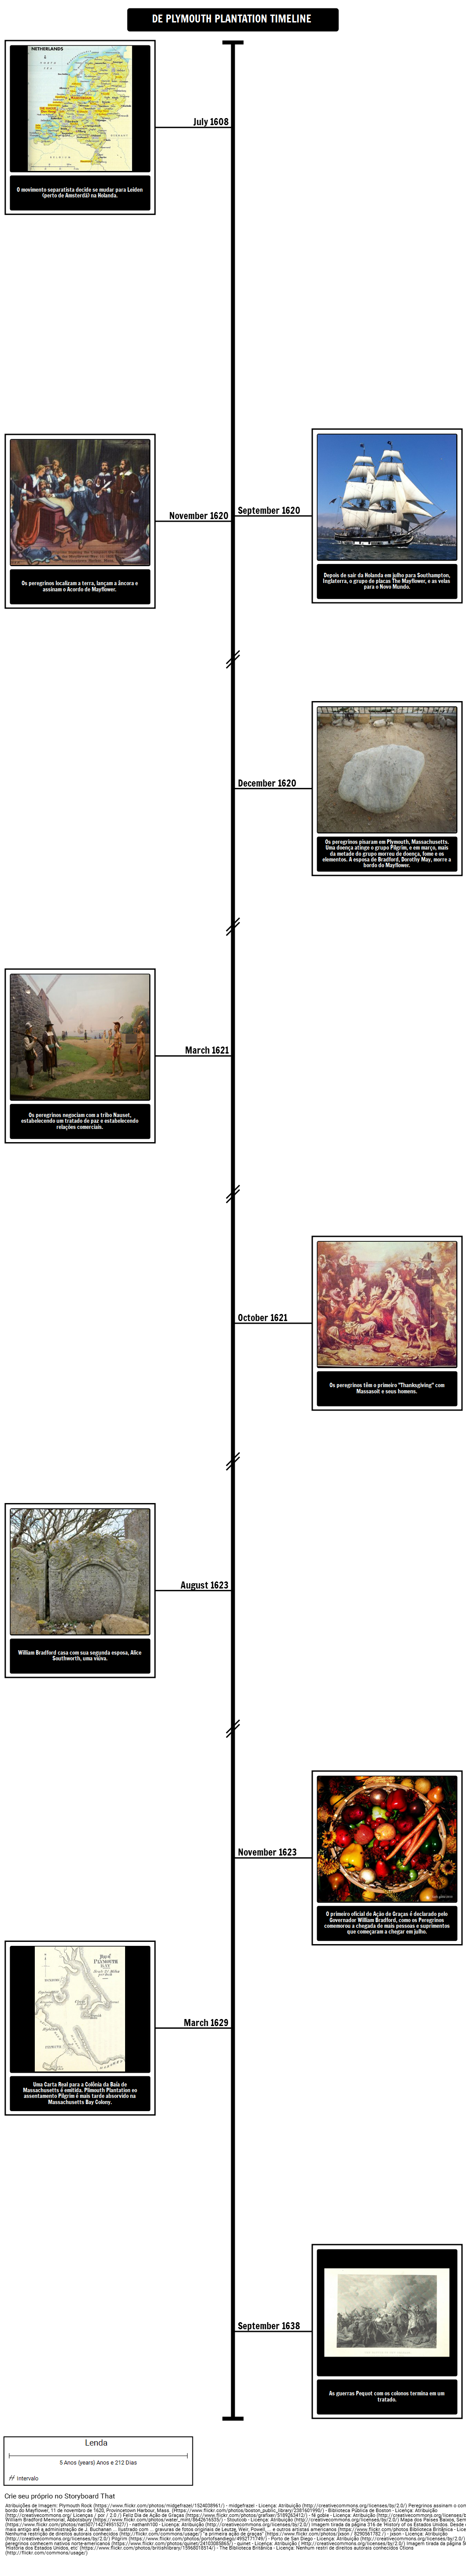 De Plymouth Plantation Timeline